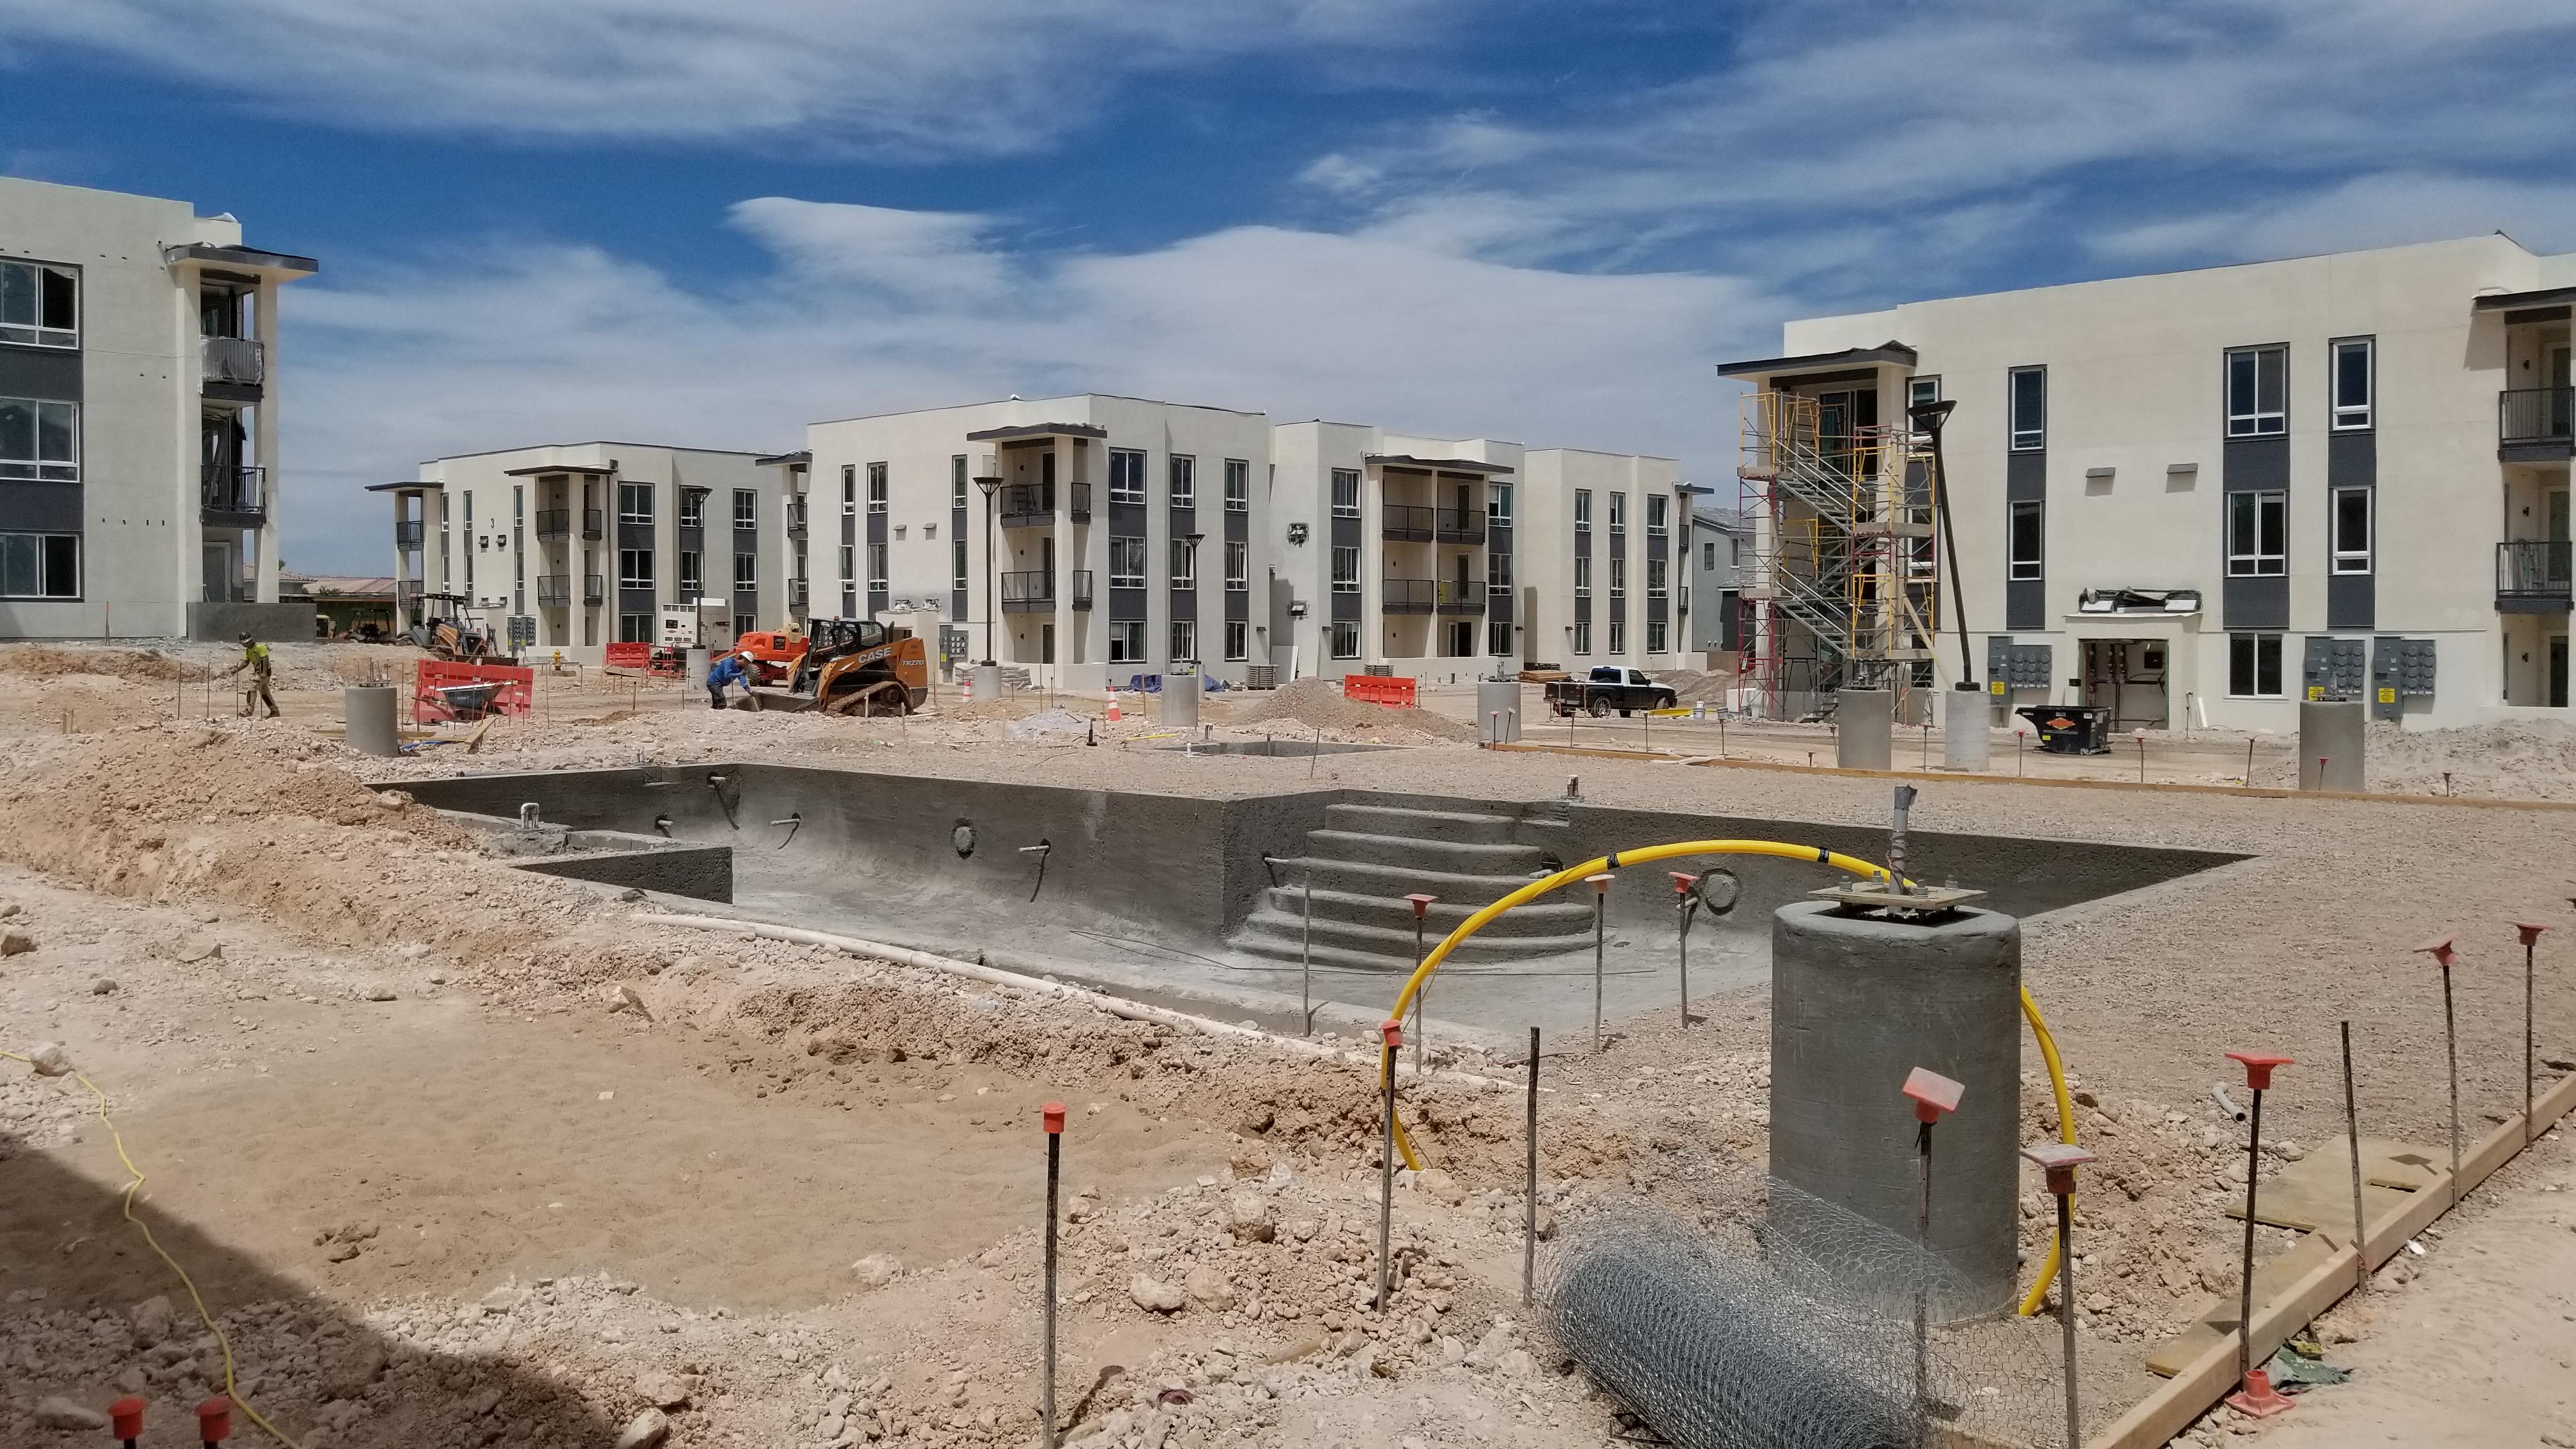 Fort Apache - Las Vegas